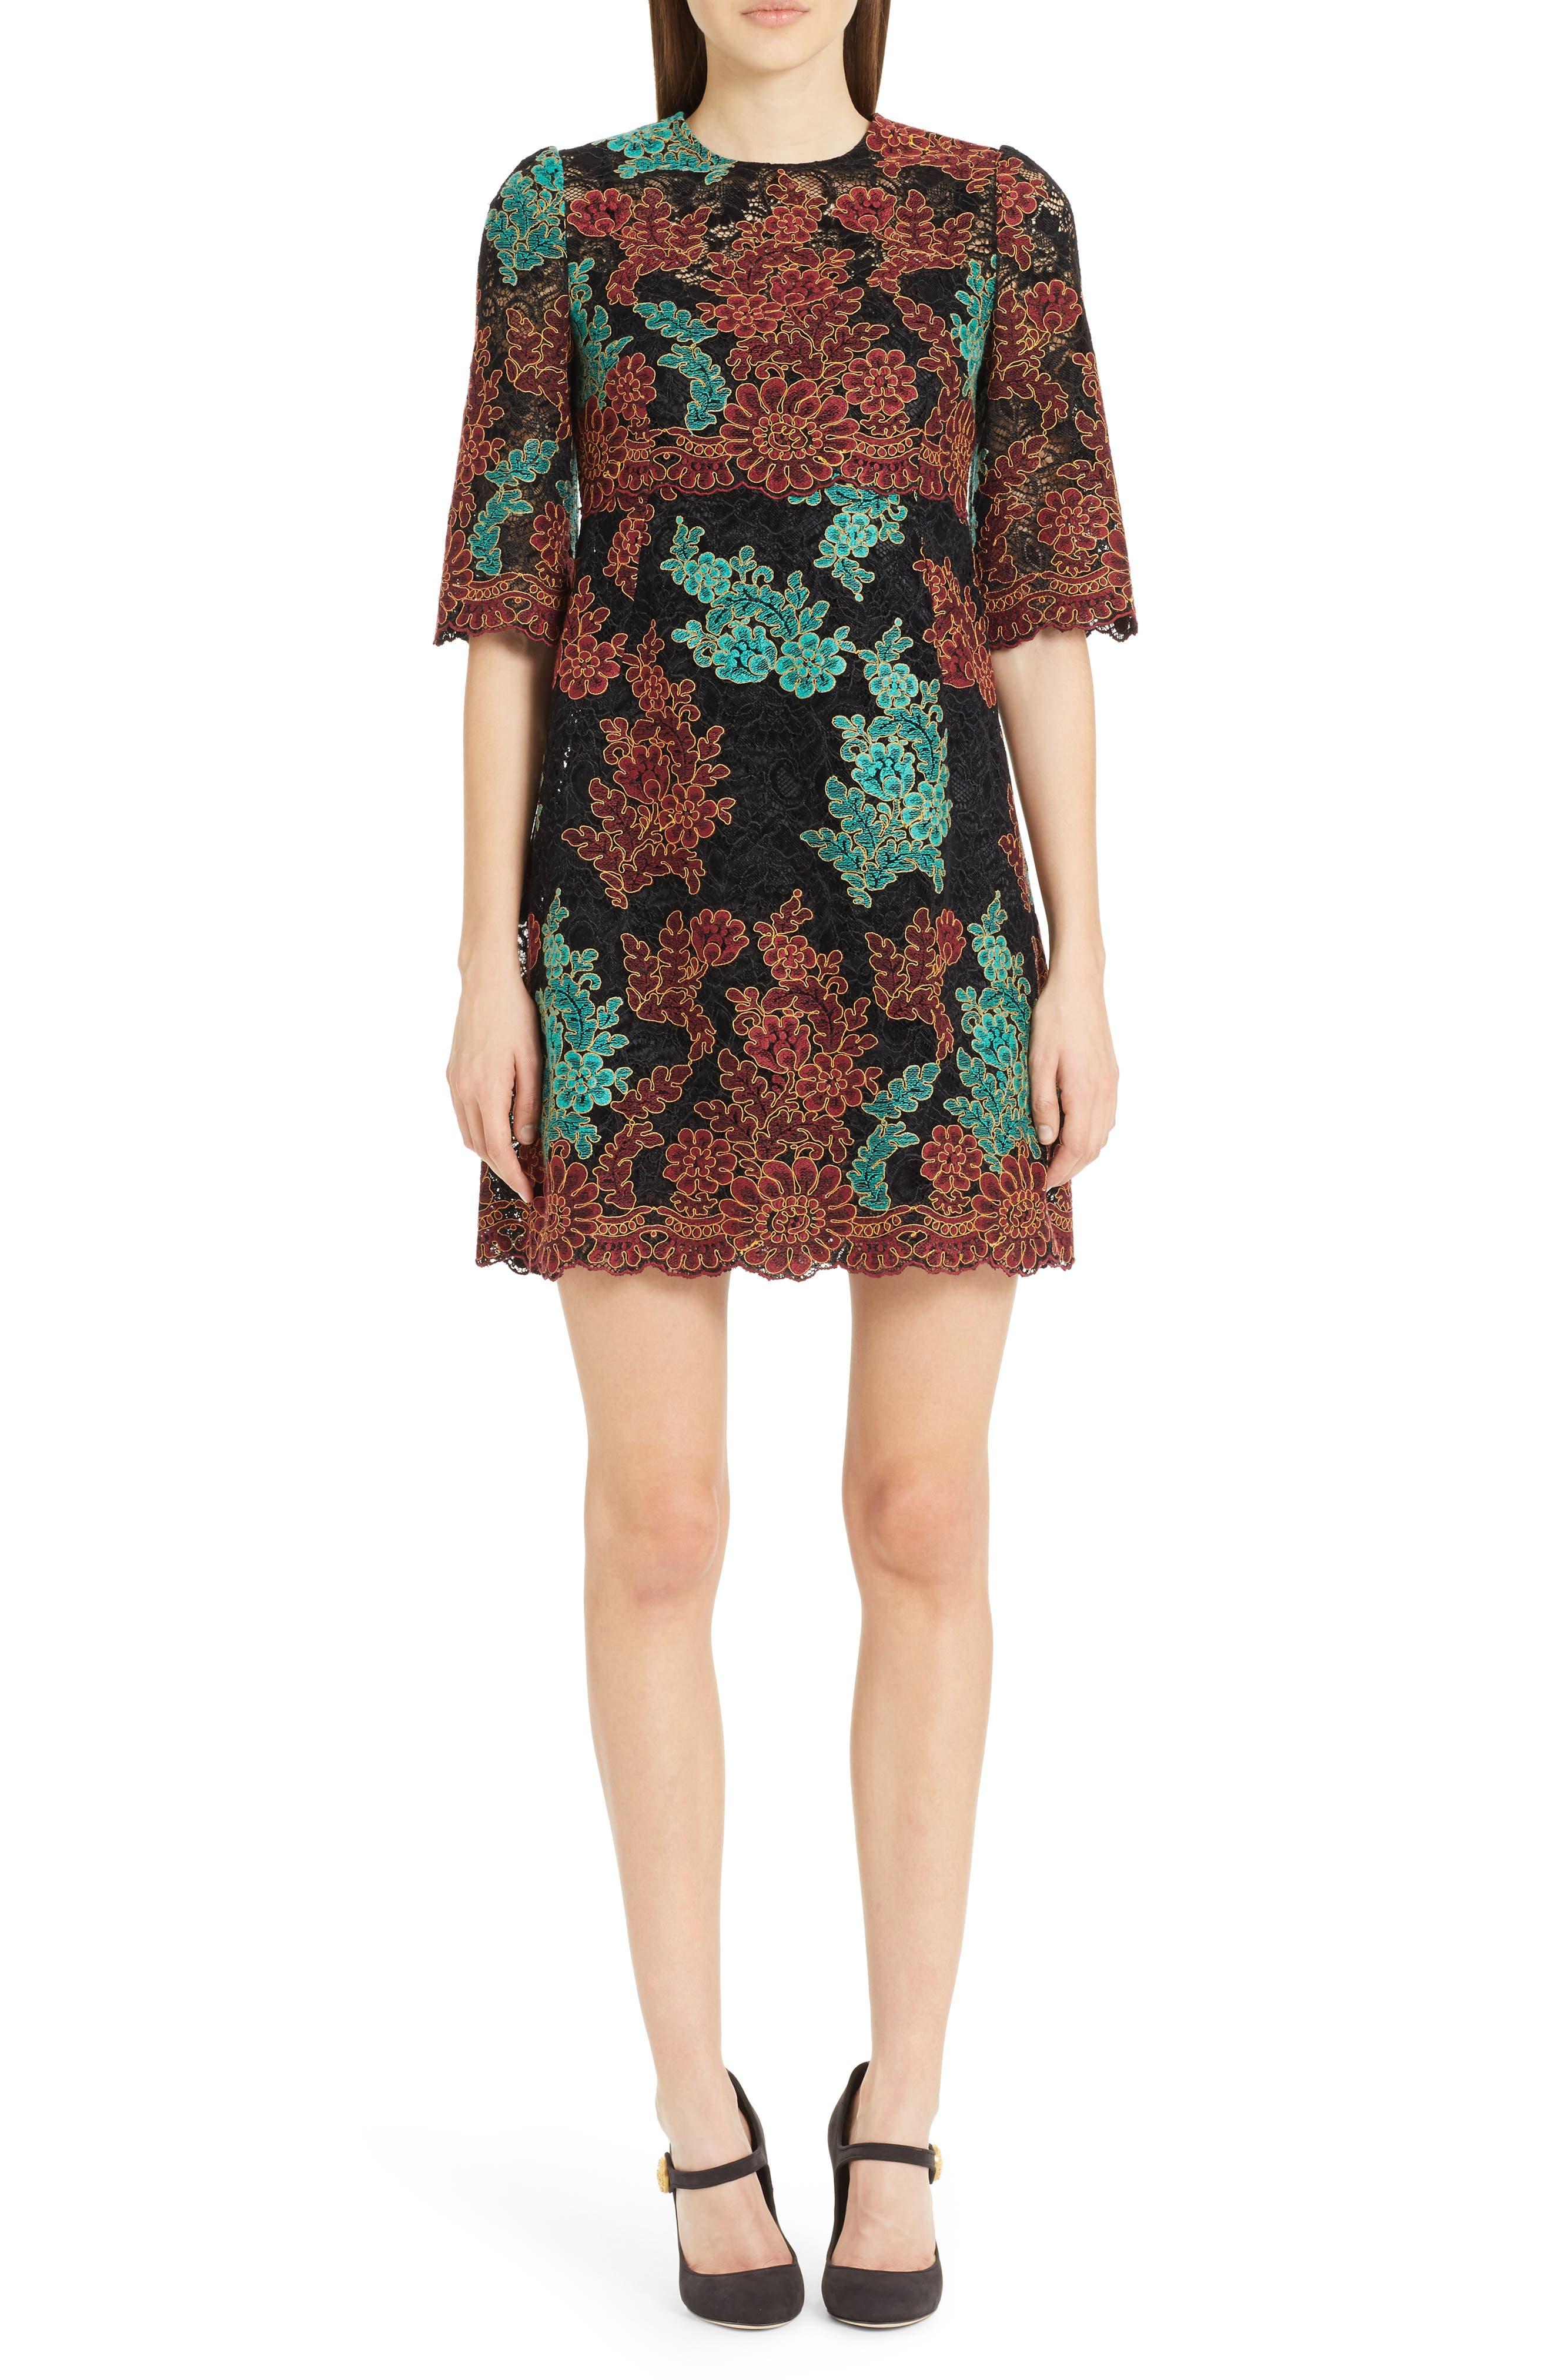 Alternate Image 1 Selected - Dolce&Gabbana Lace Minidress